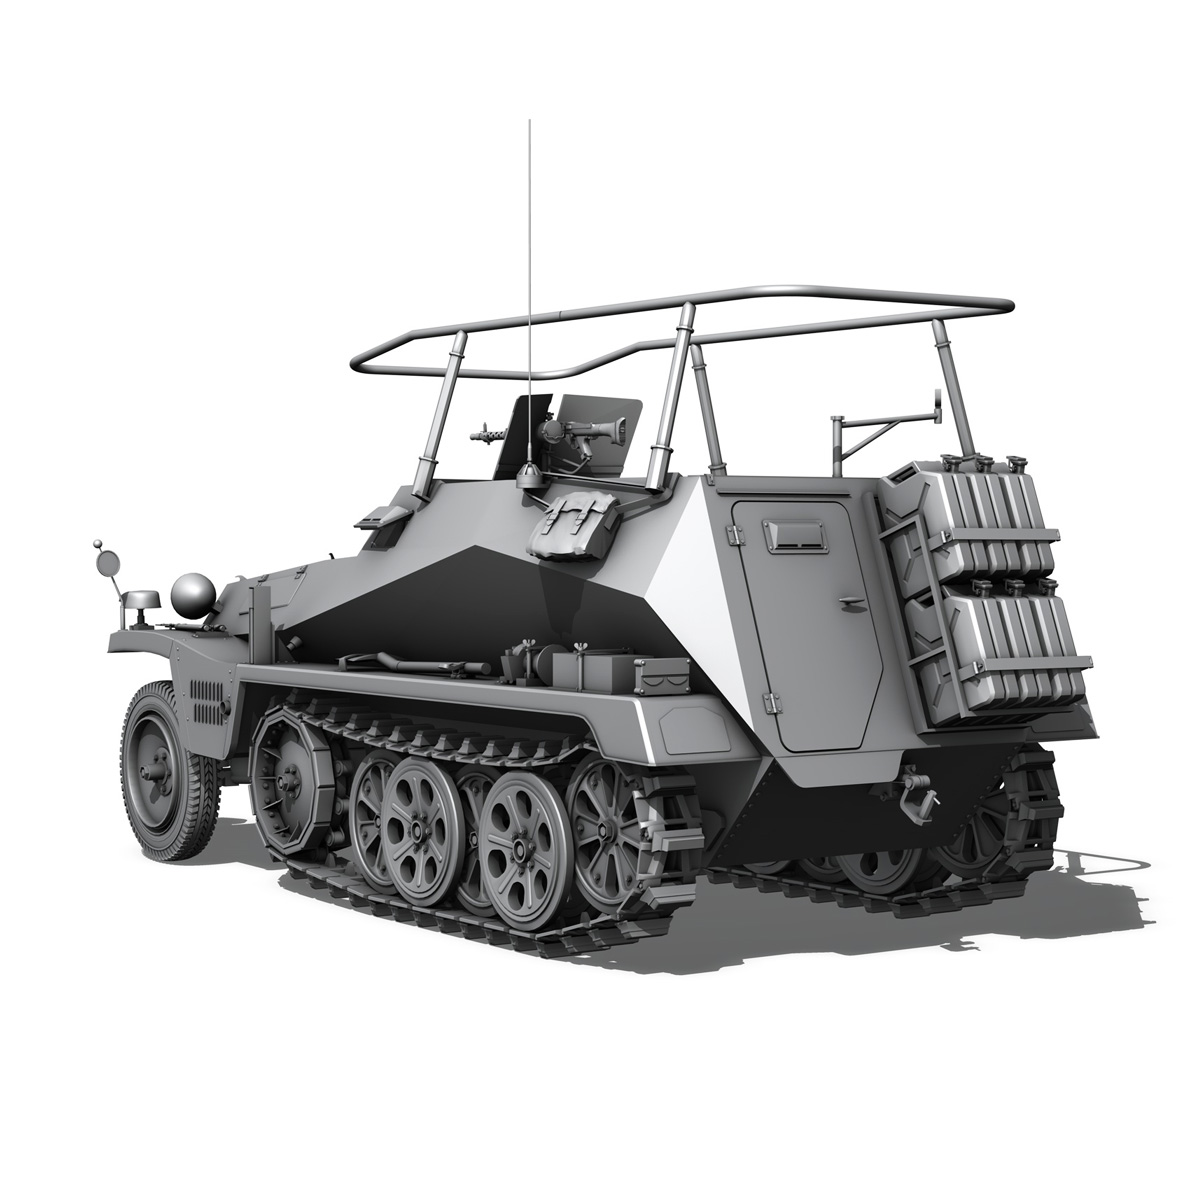 sdkfz 250 – command halftrack 3d model 3ds fbx c4d lwo obj 251672